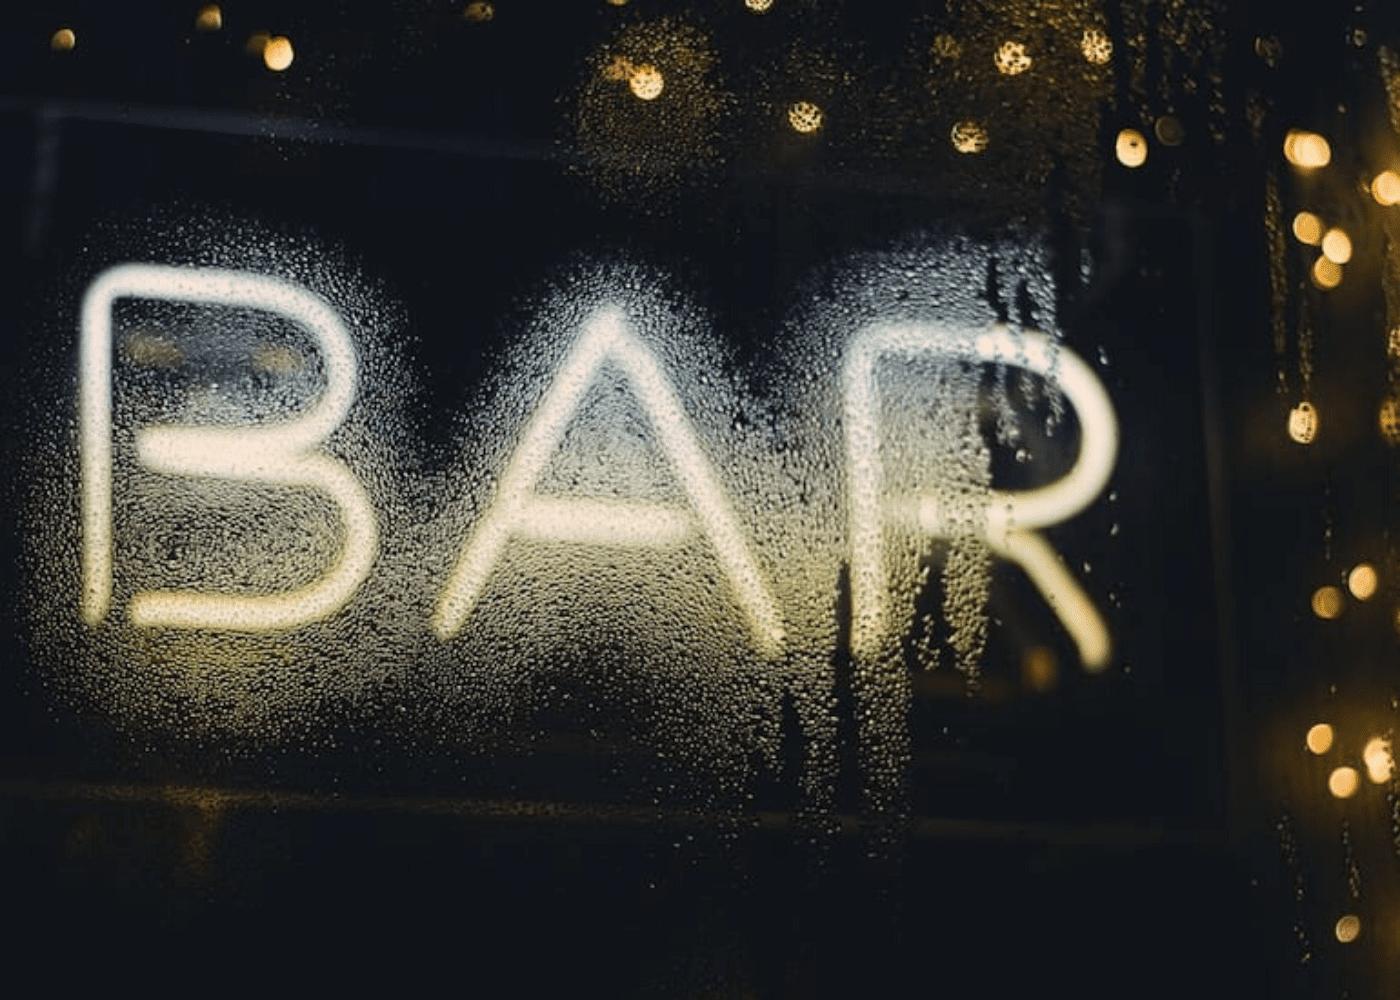 James Sutton bar unsplash mums night out